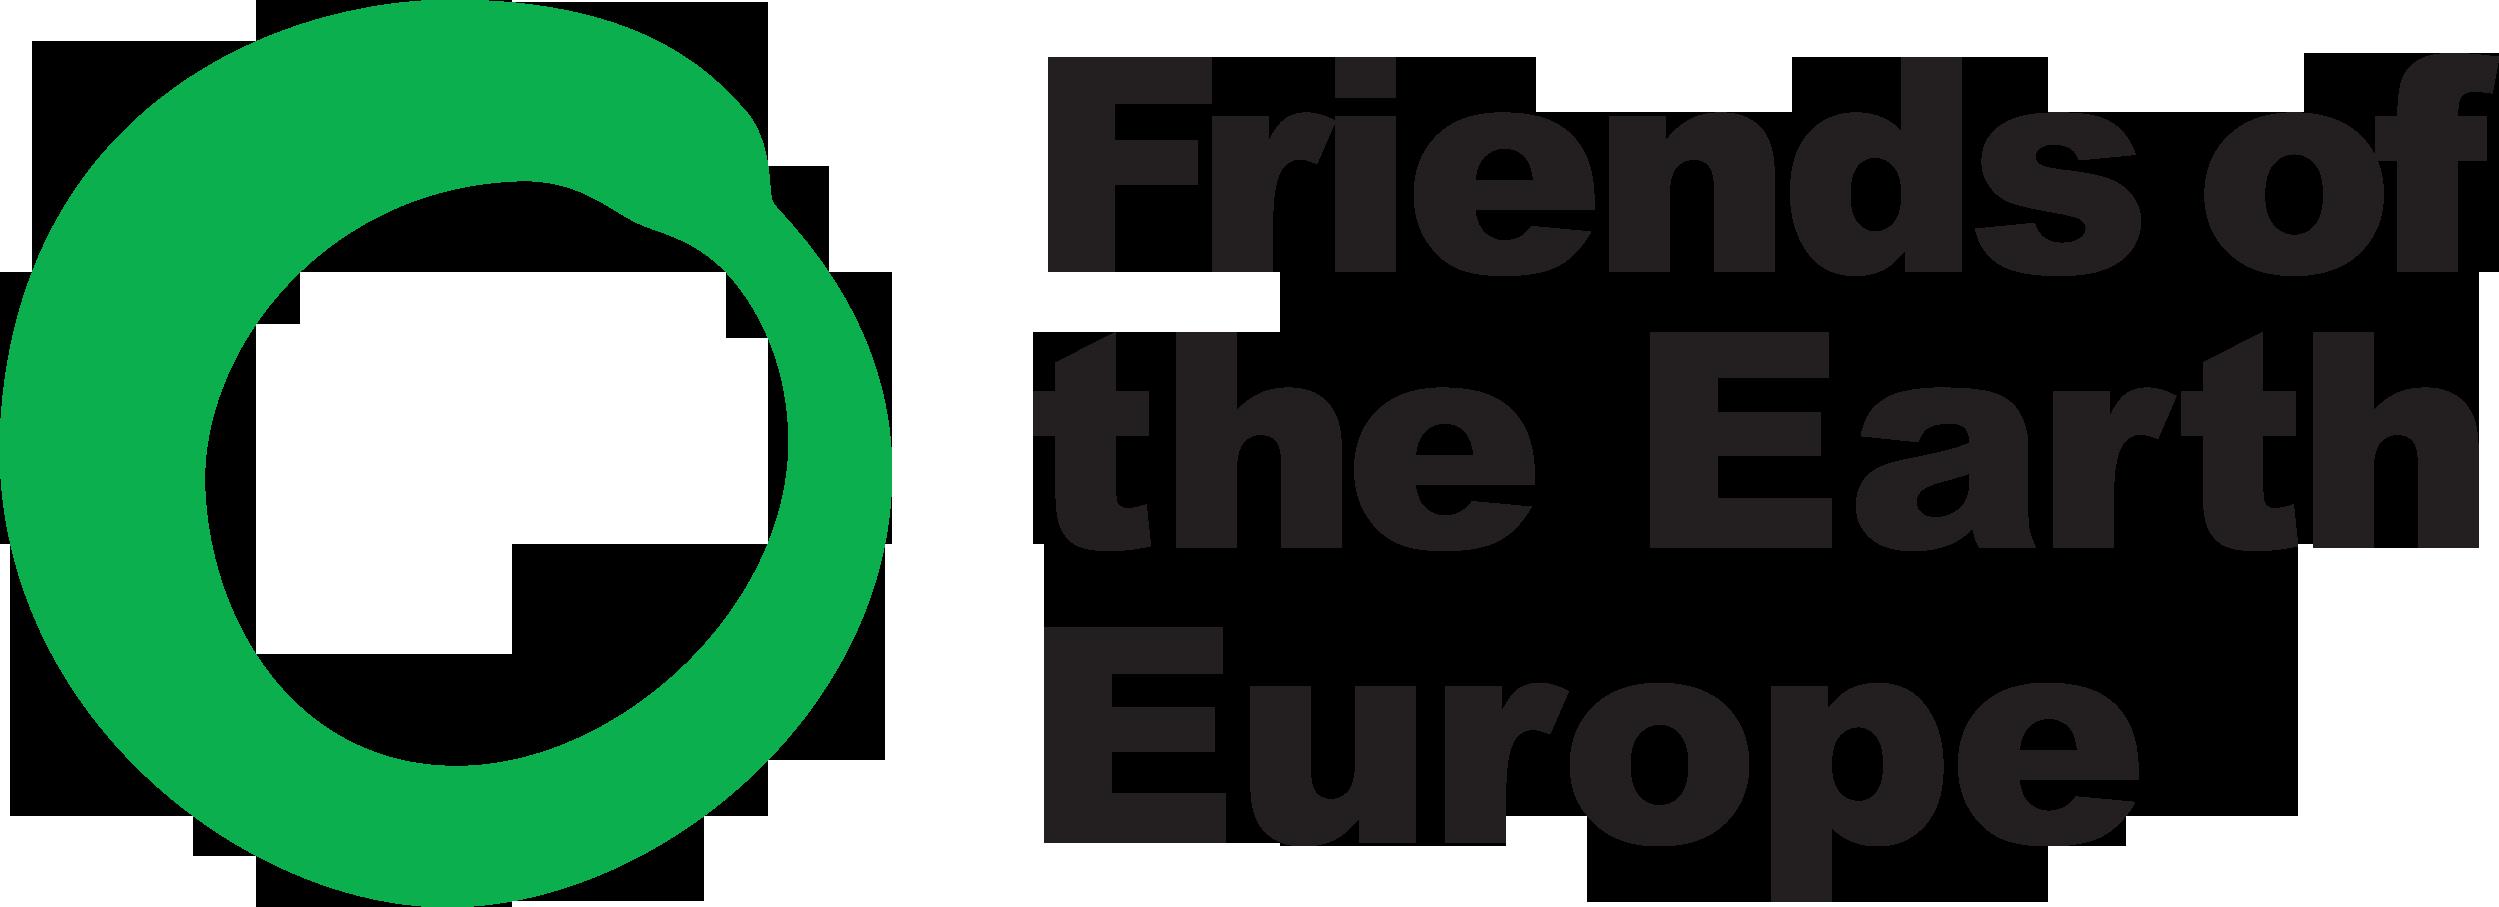 FoEE logo